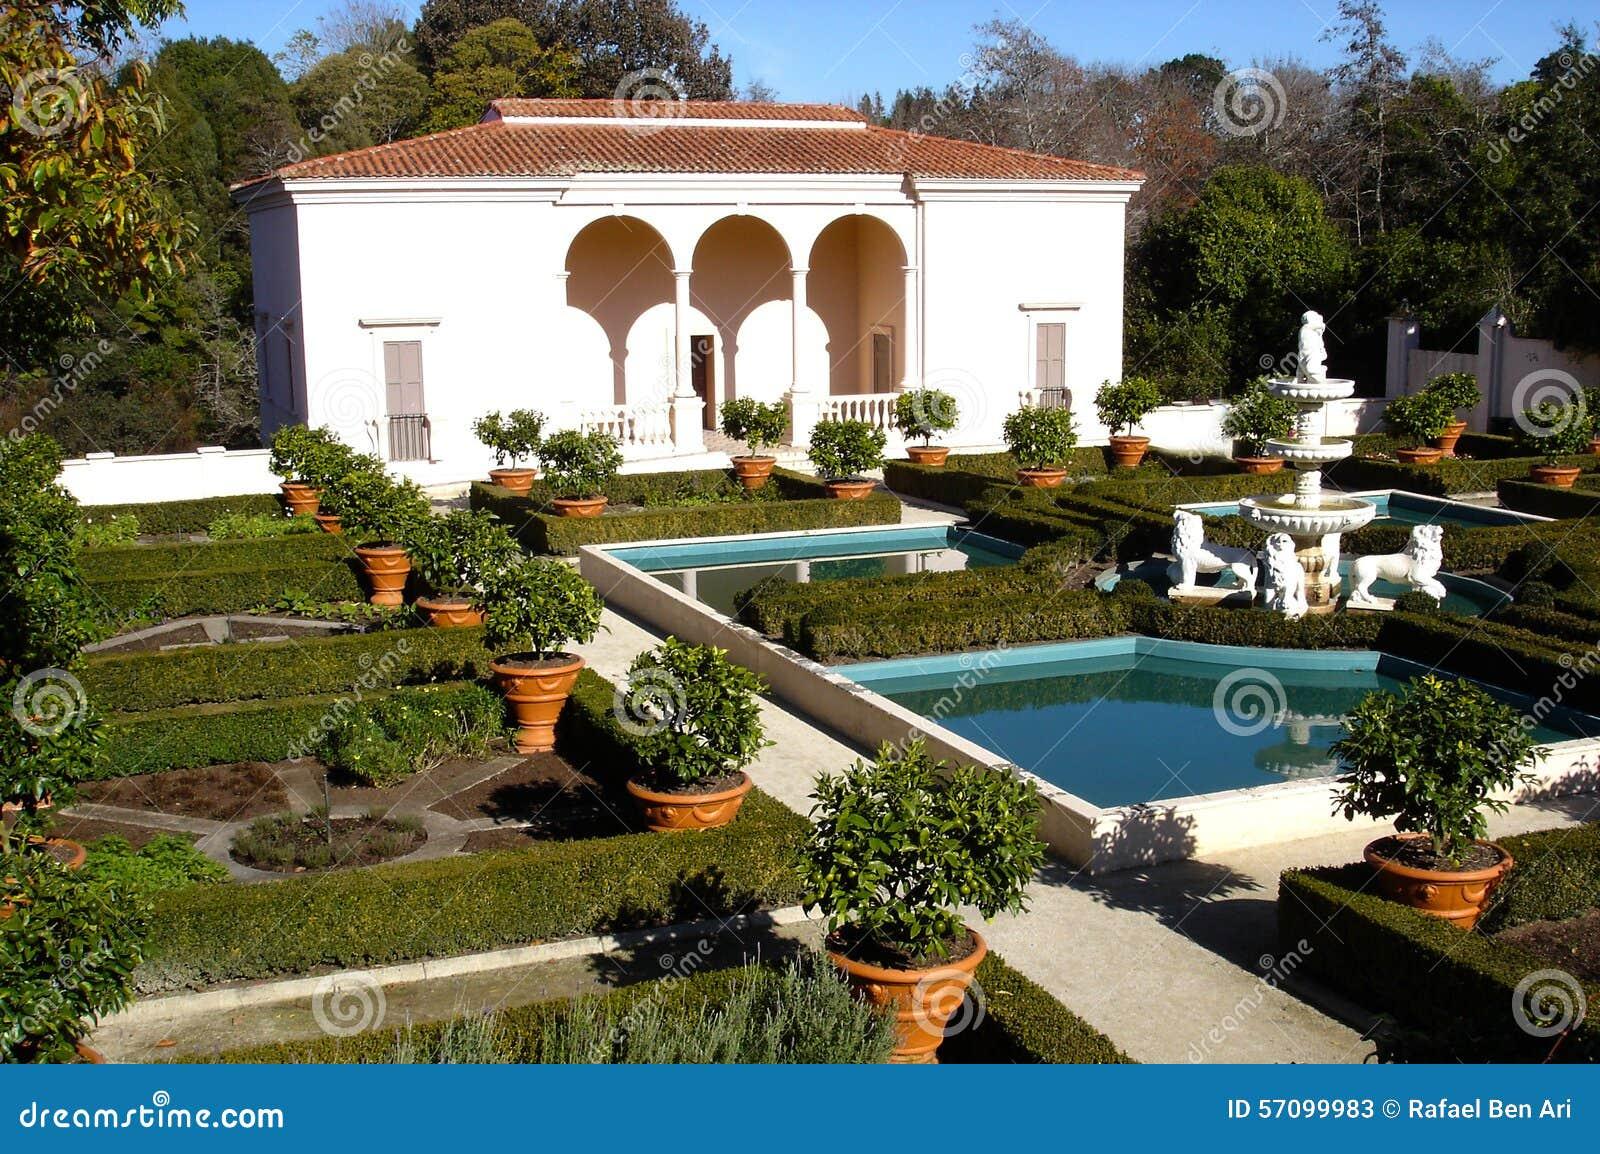 Italian renaissance garden in hamilton gardens new zealand for Jardin italien